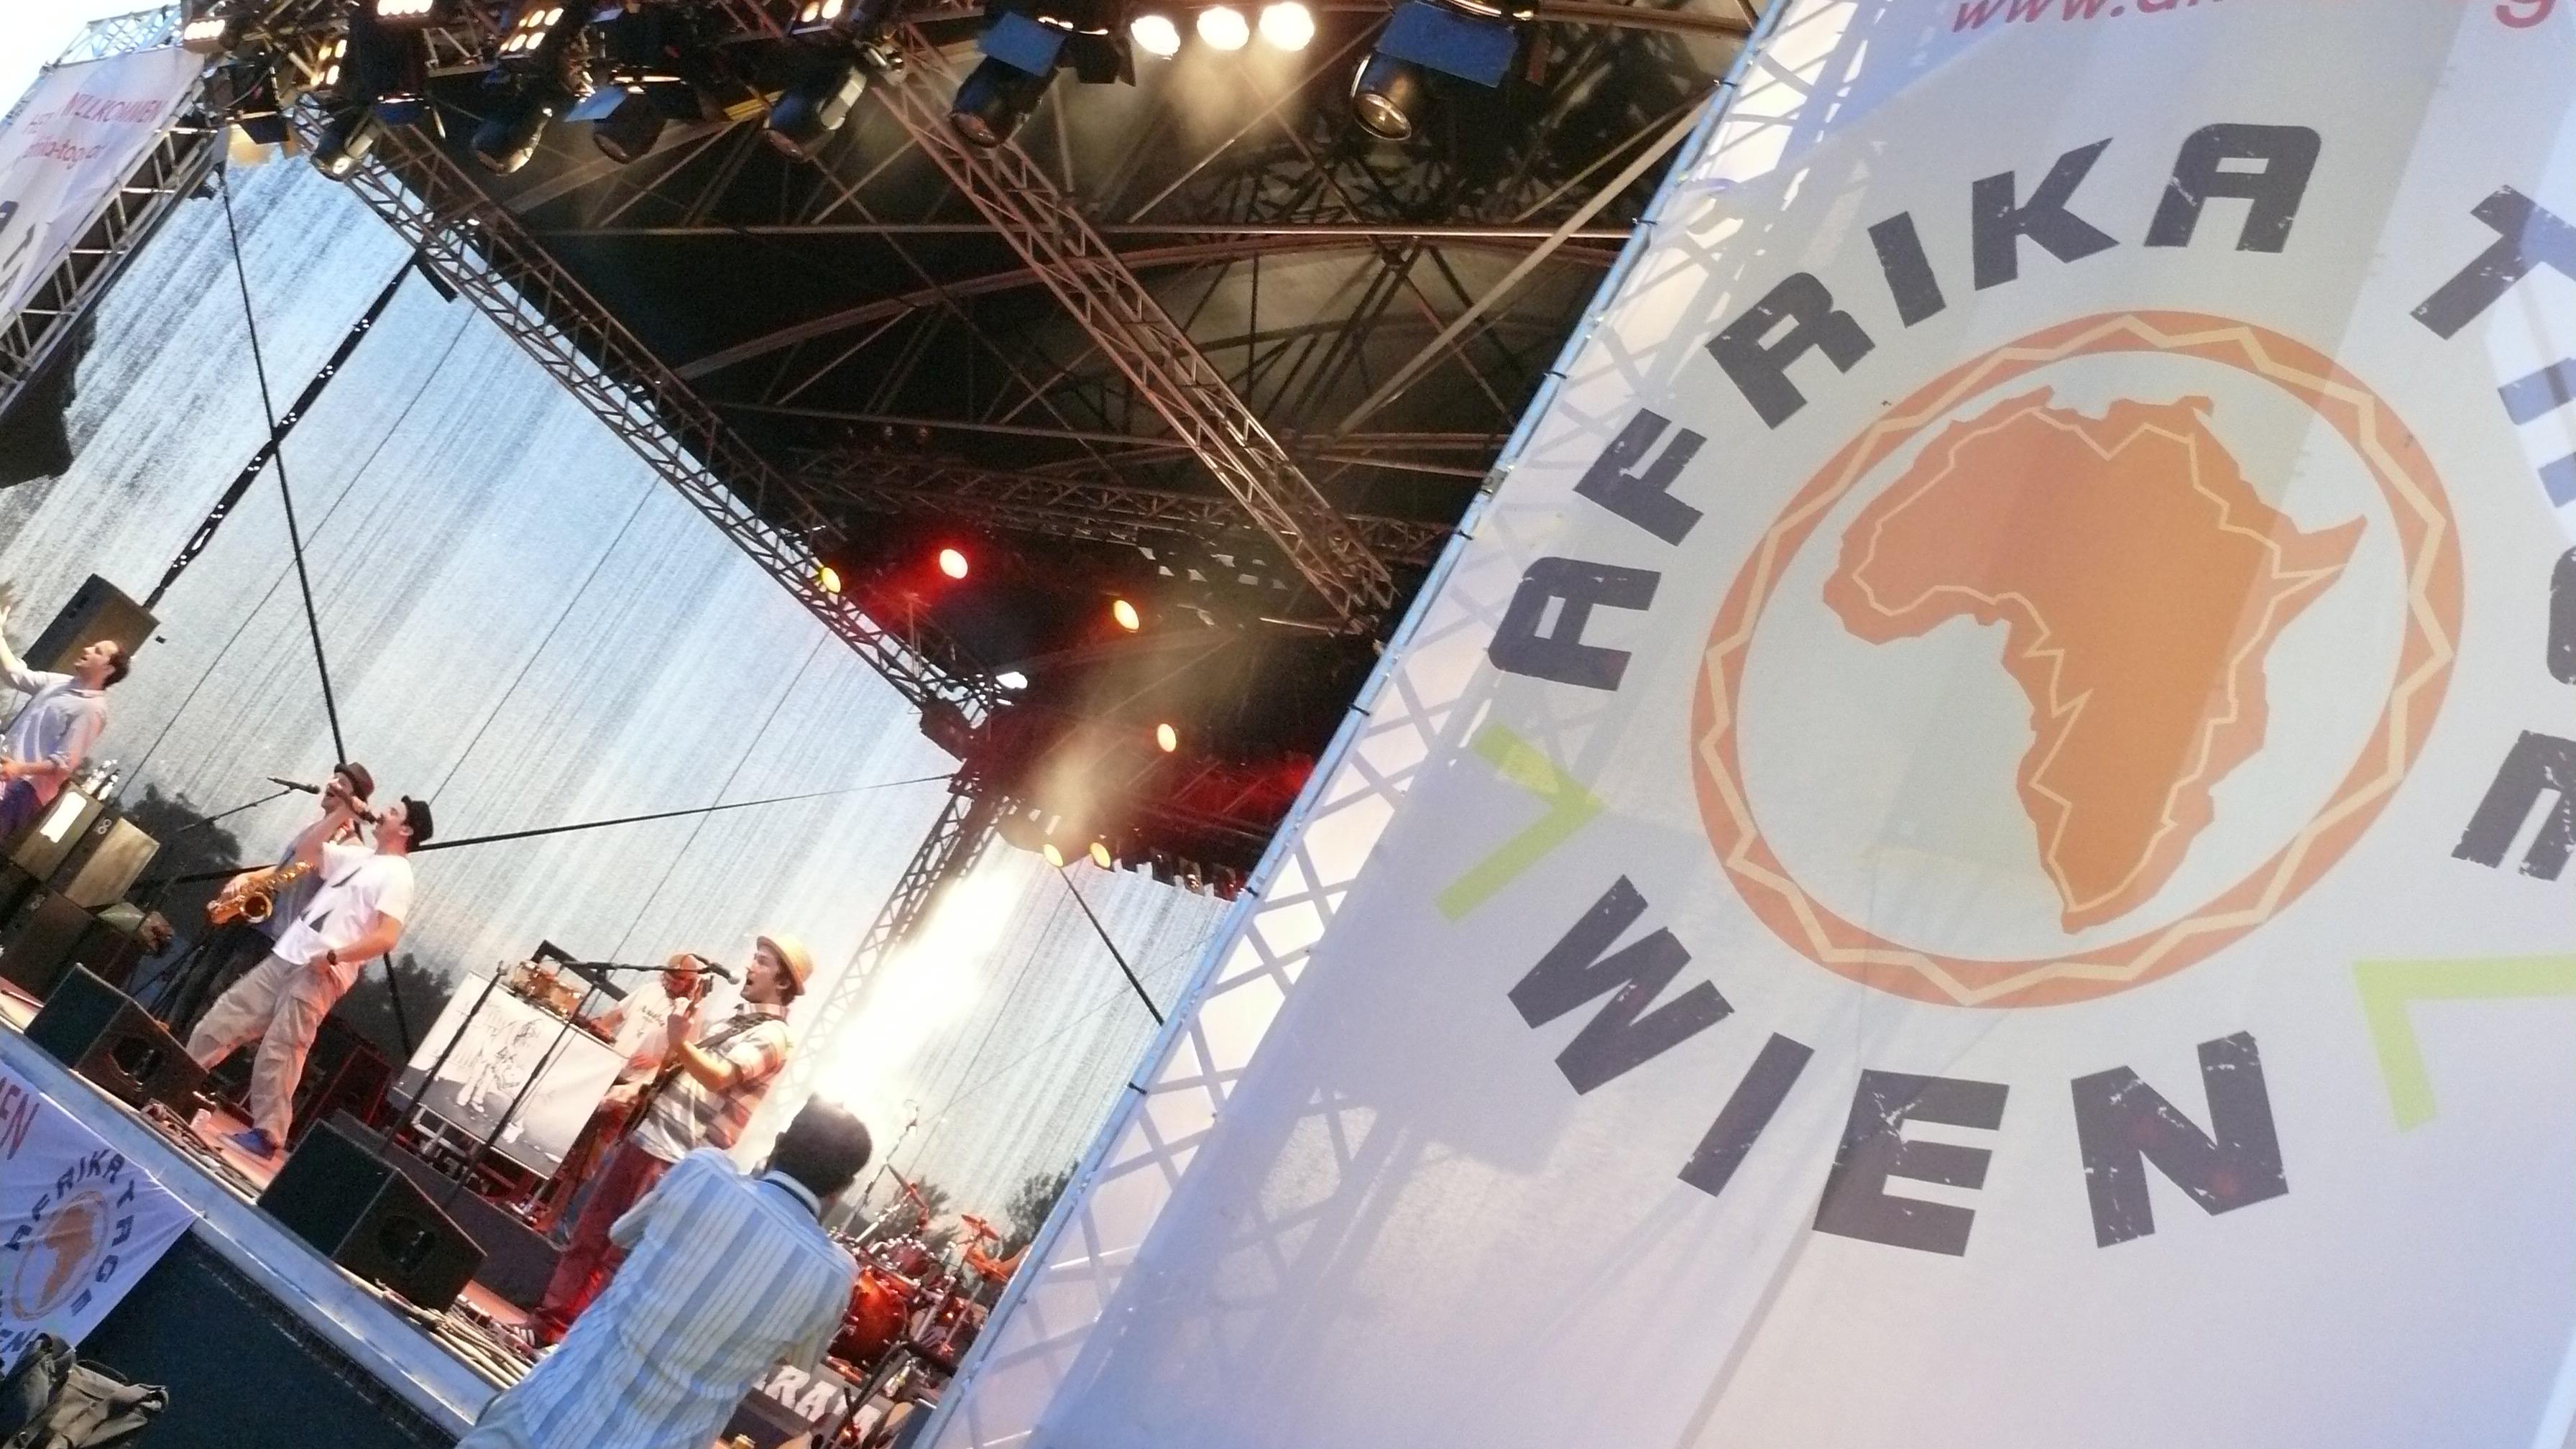 Die Afrika Tage Wien bringen 18 Tage grandiose Musik, Kulinarik und mehr